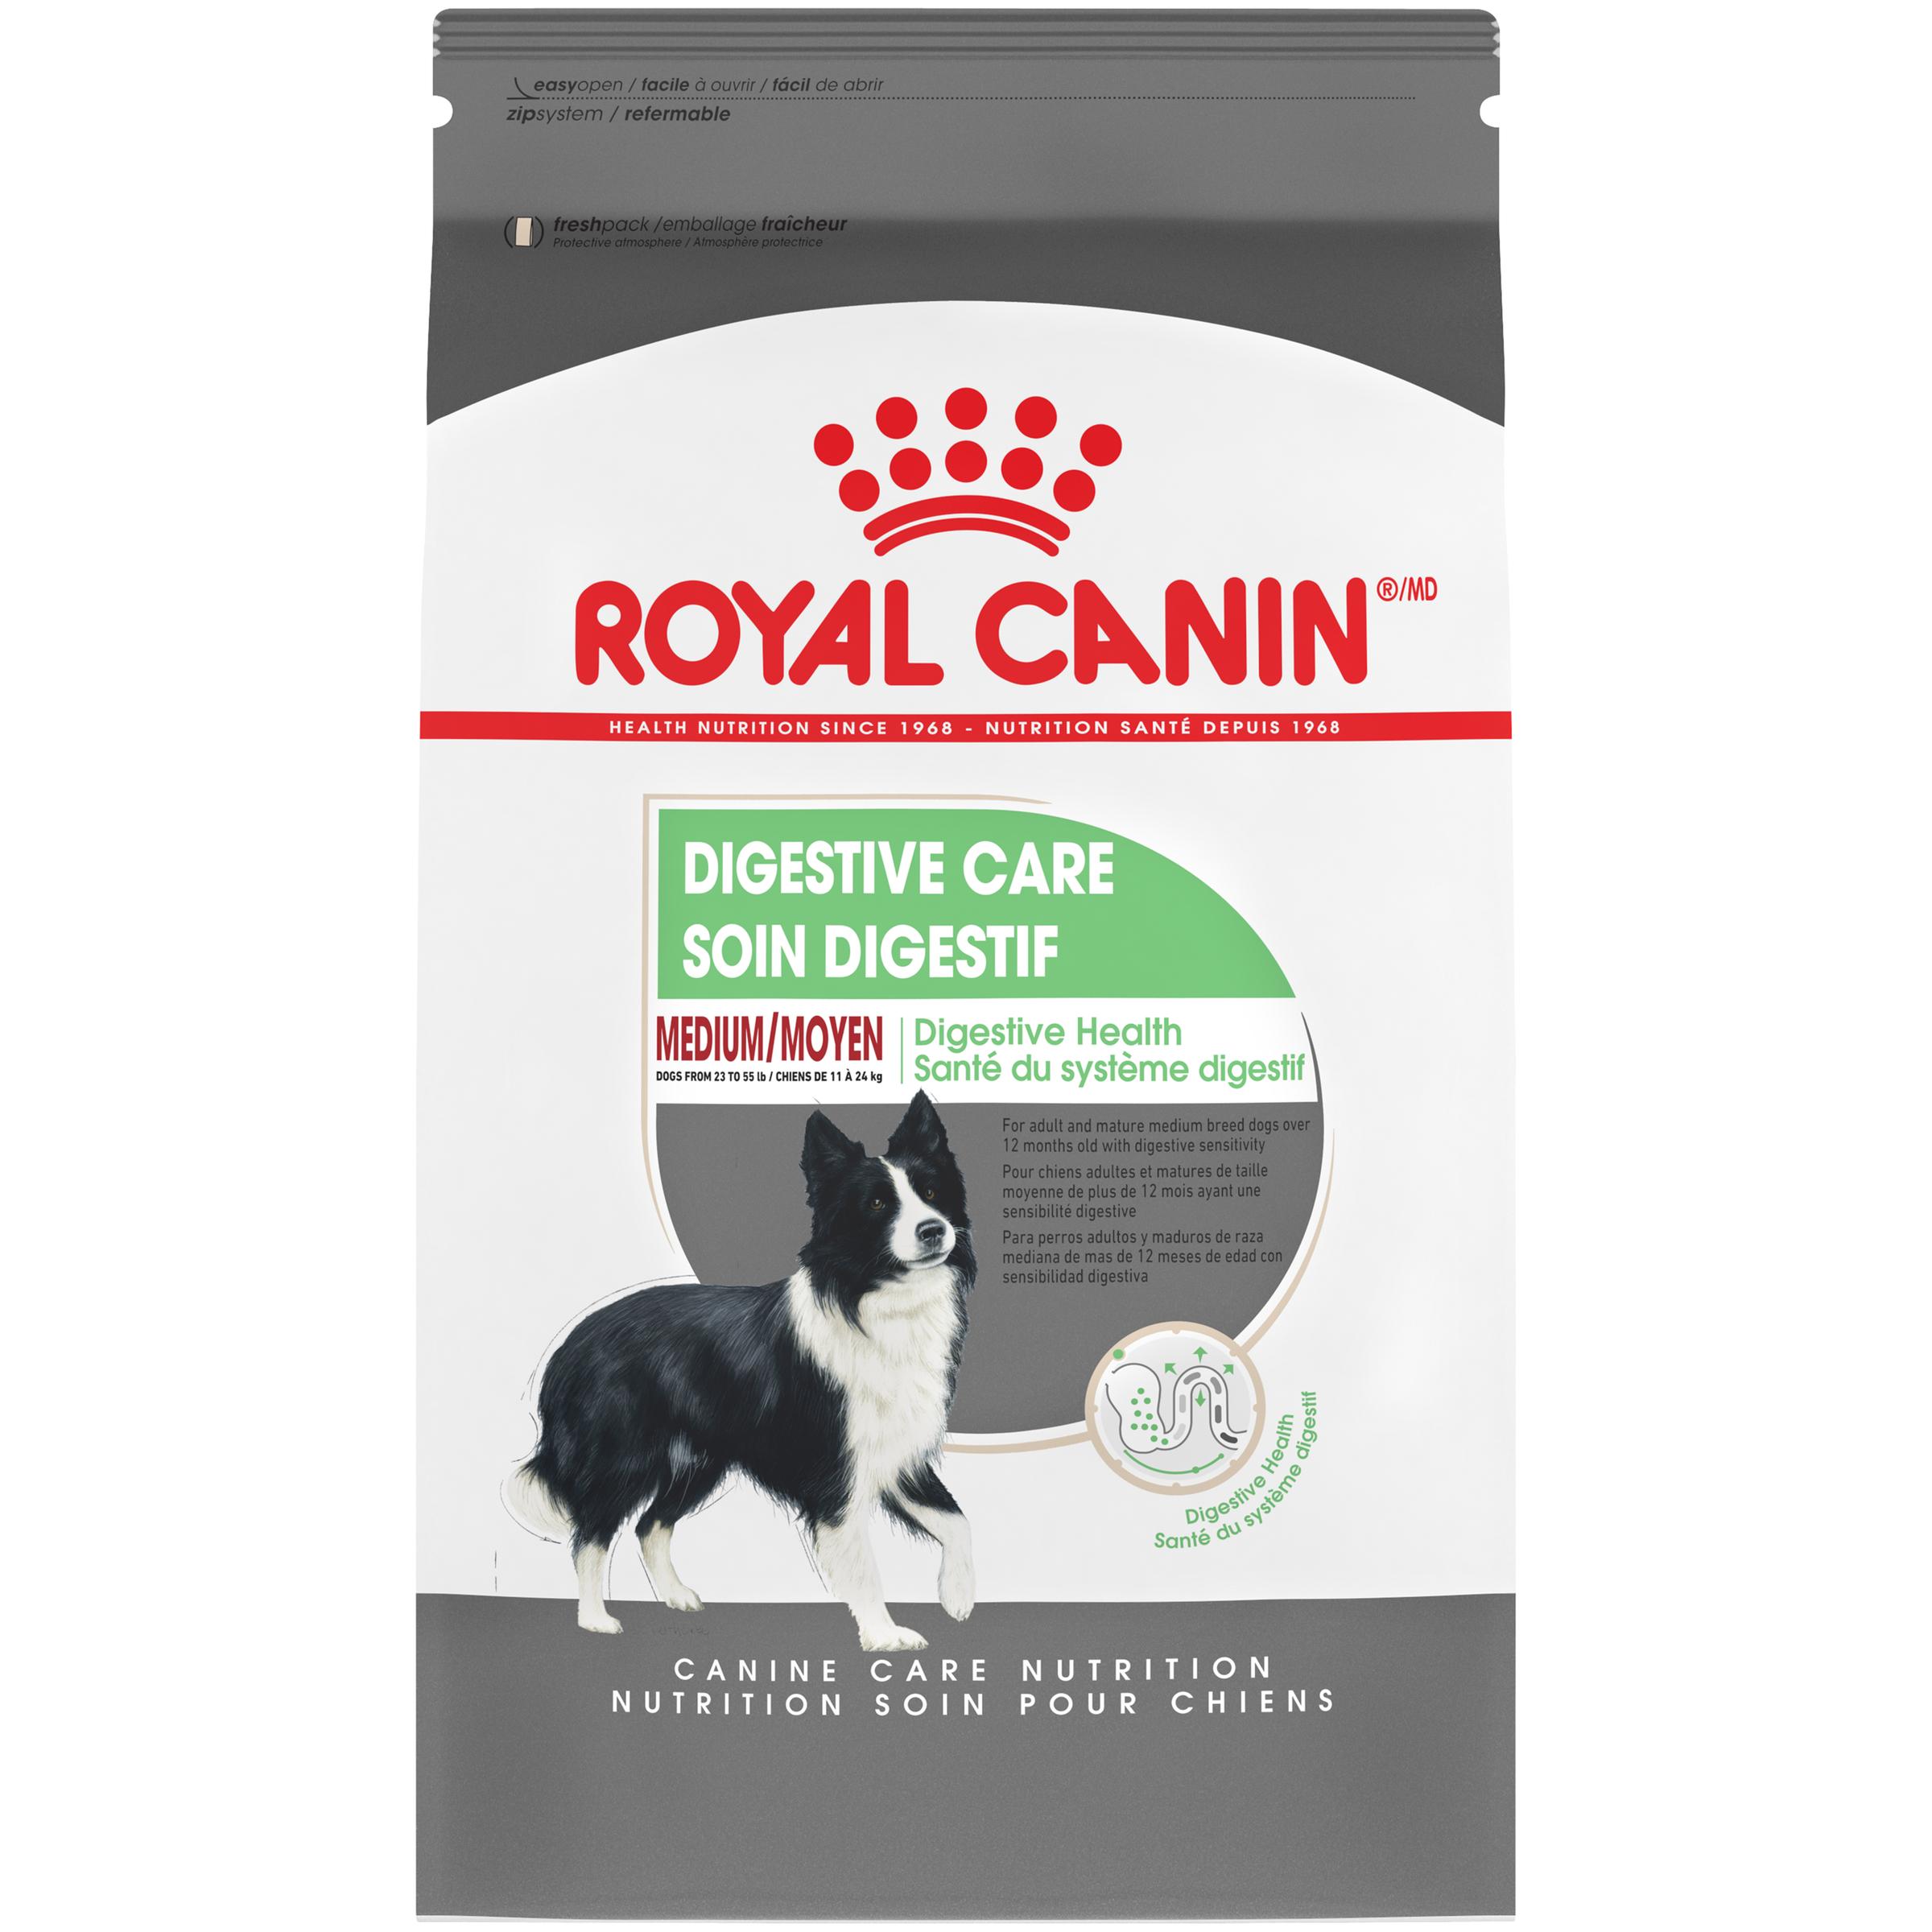 Royal Canin Canine Care Nutrition Medium Digestive Care Dry Dog Food Image